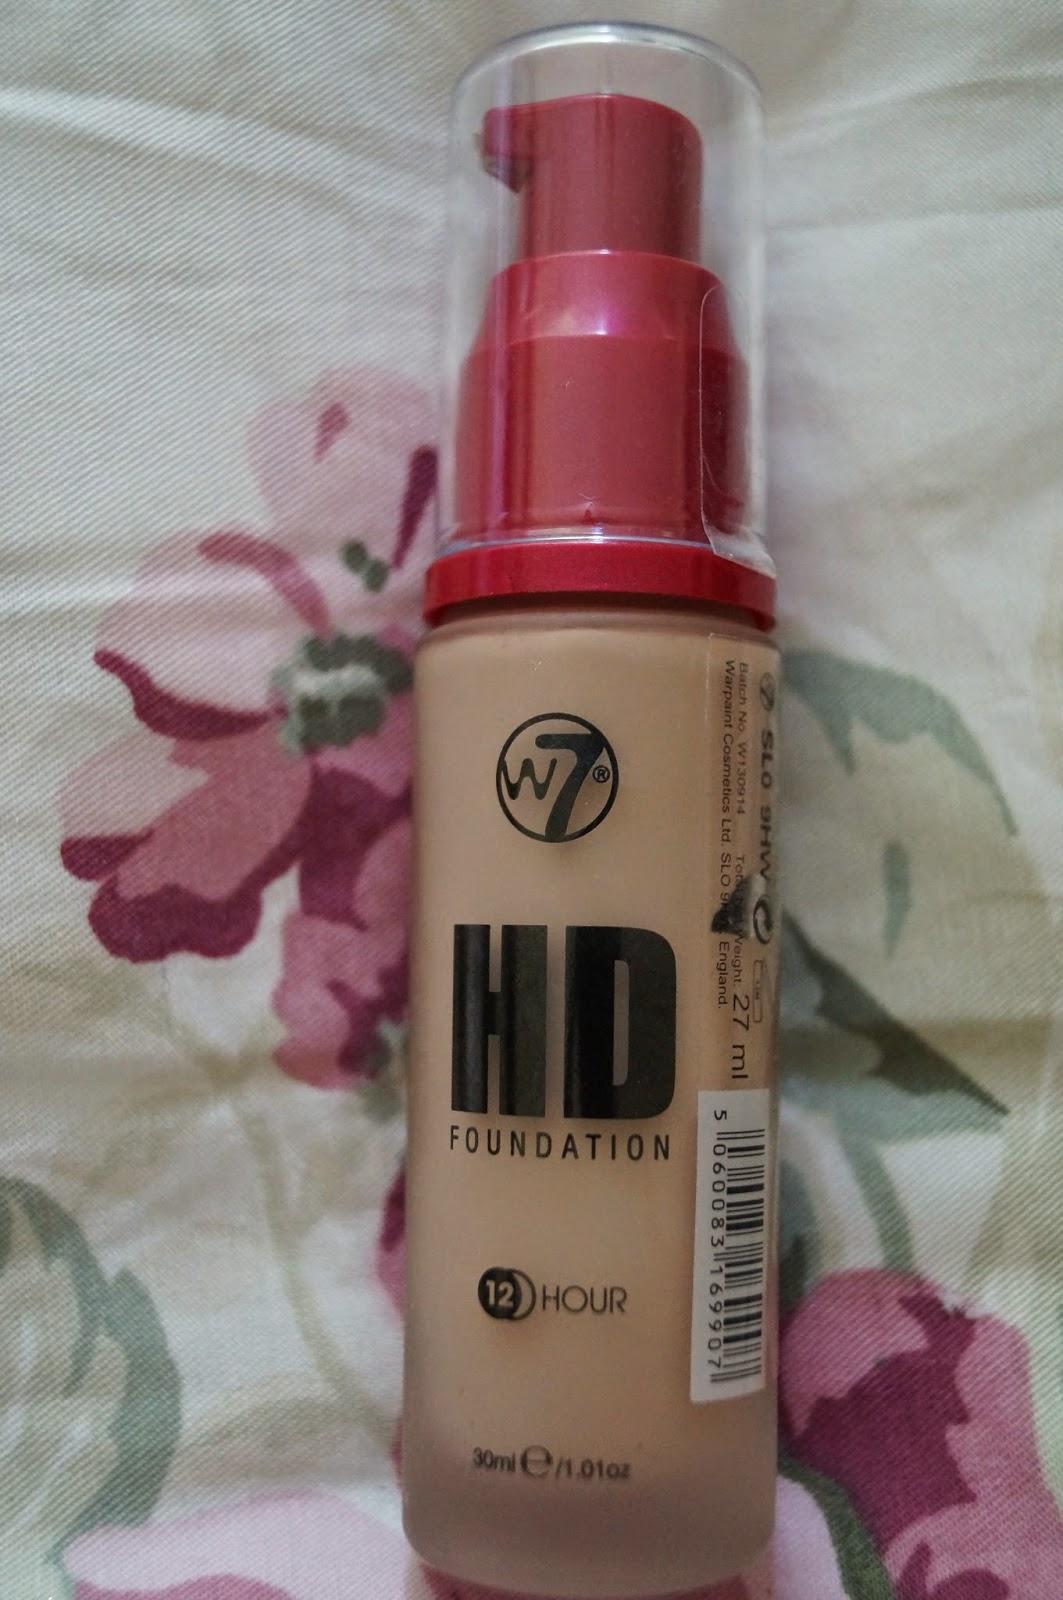 w7 makeup anmeldelse